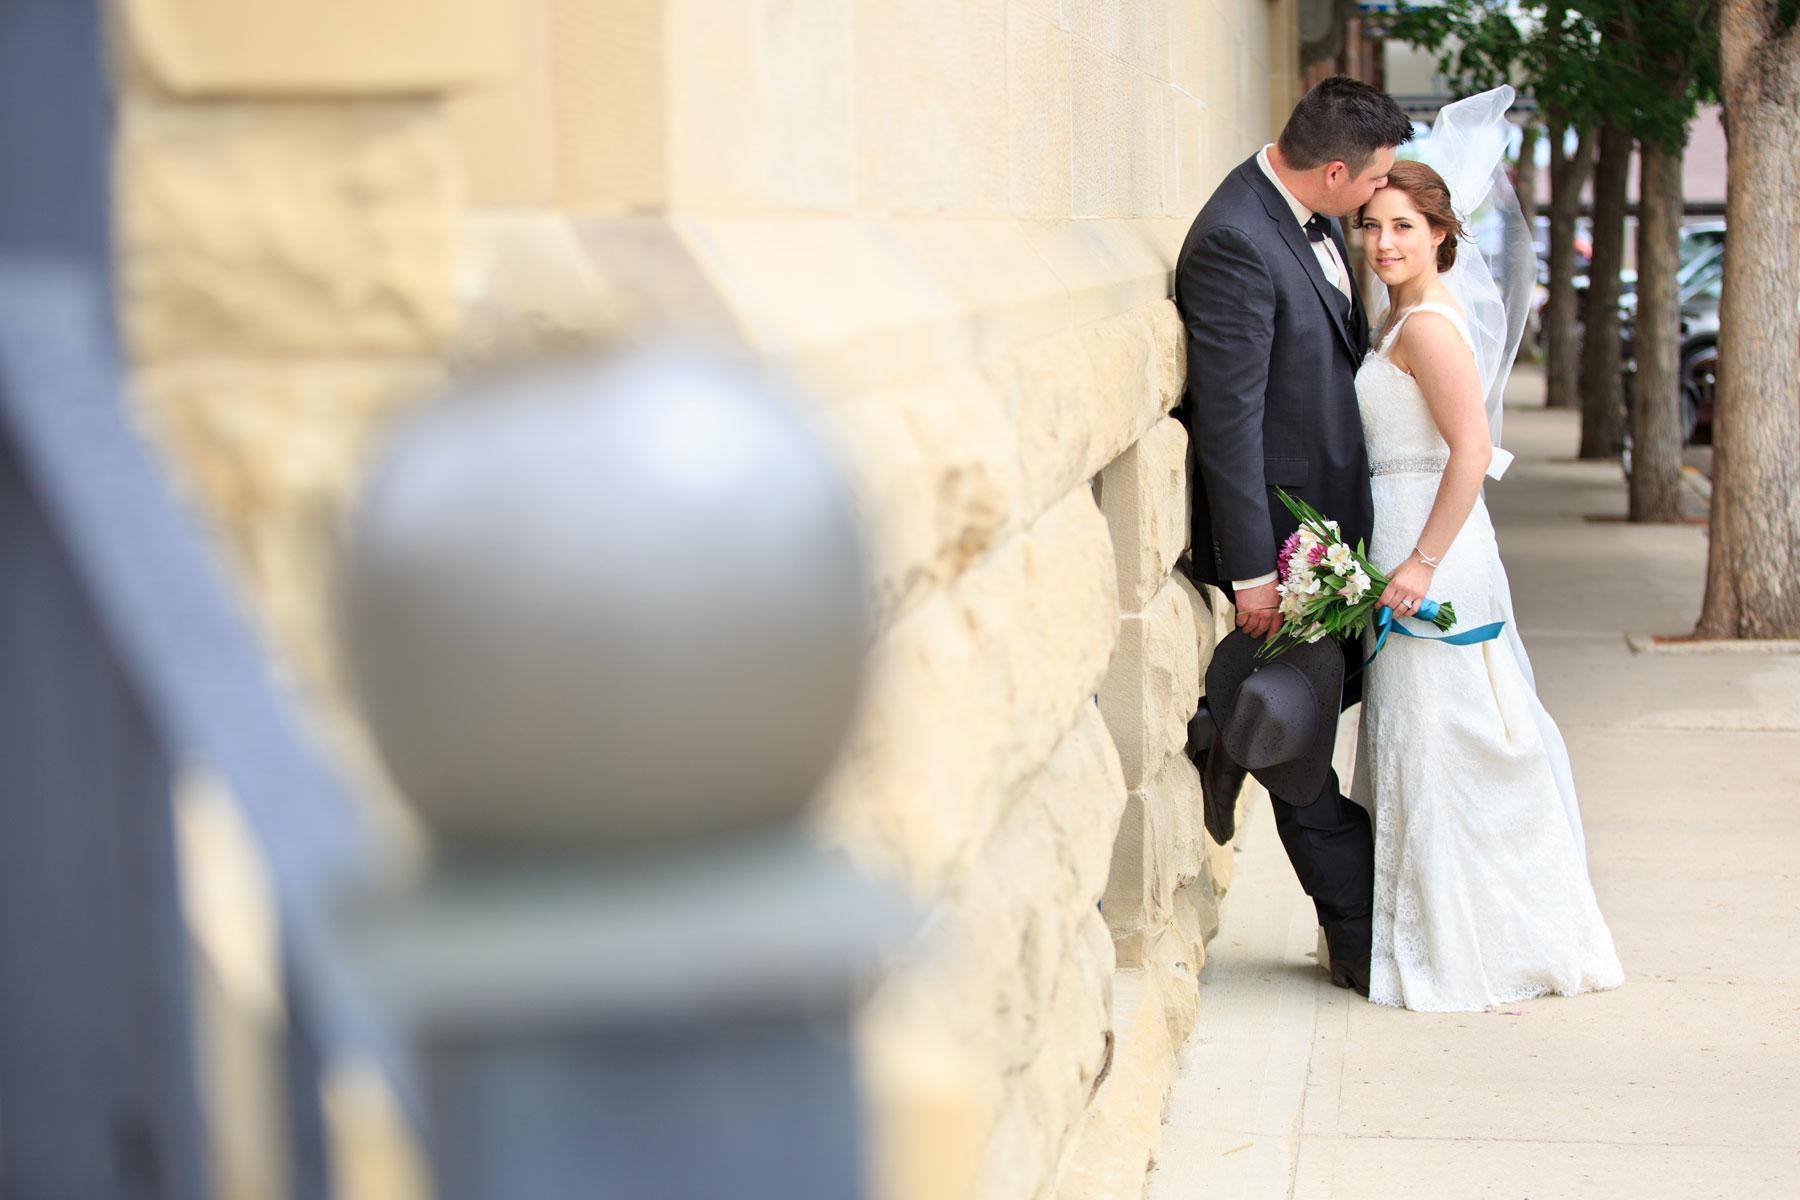 Angela & Patrick - Lacombe, Alberta Wedding Photography - Olson Studios (19)